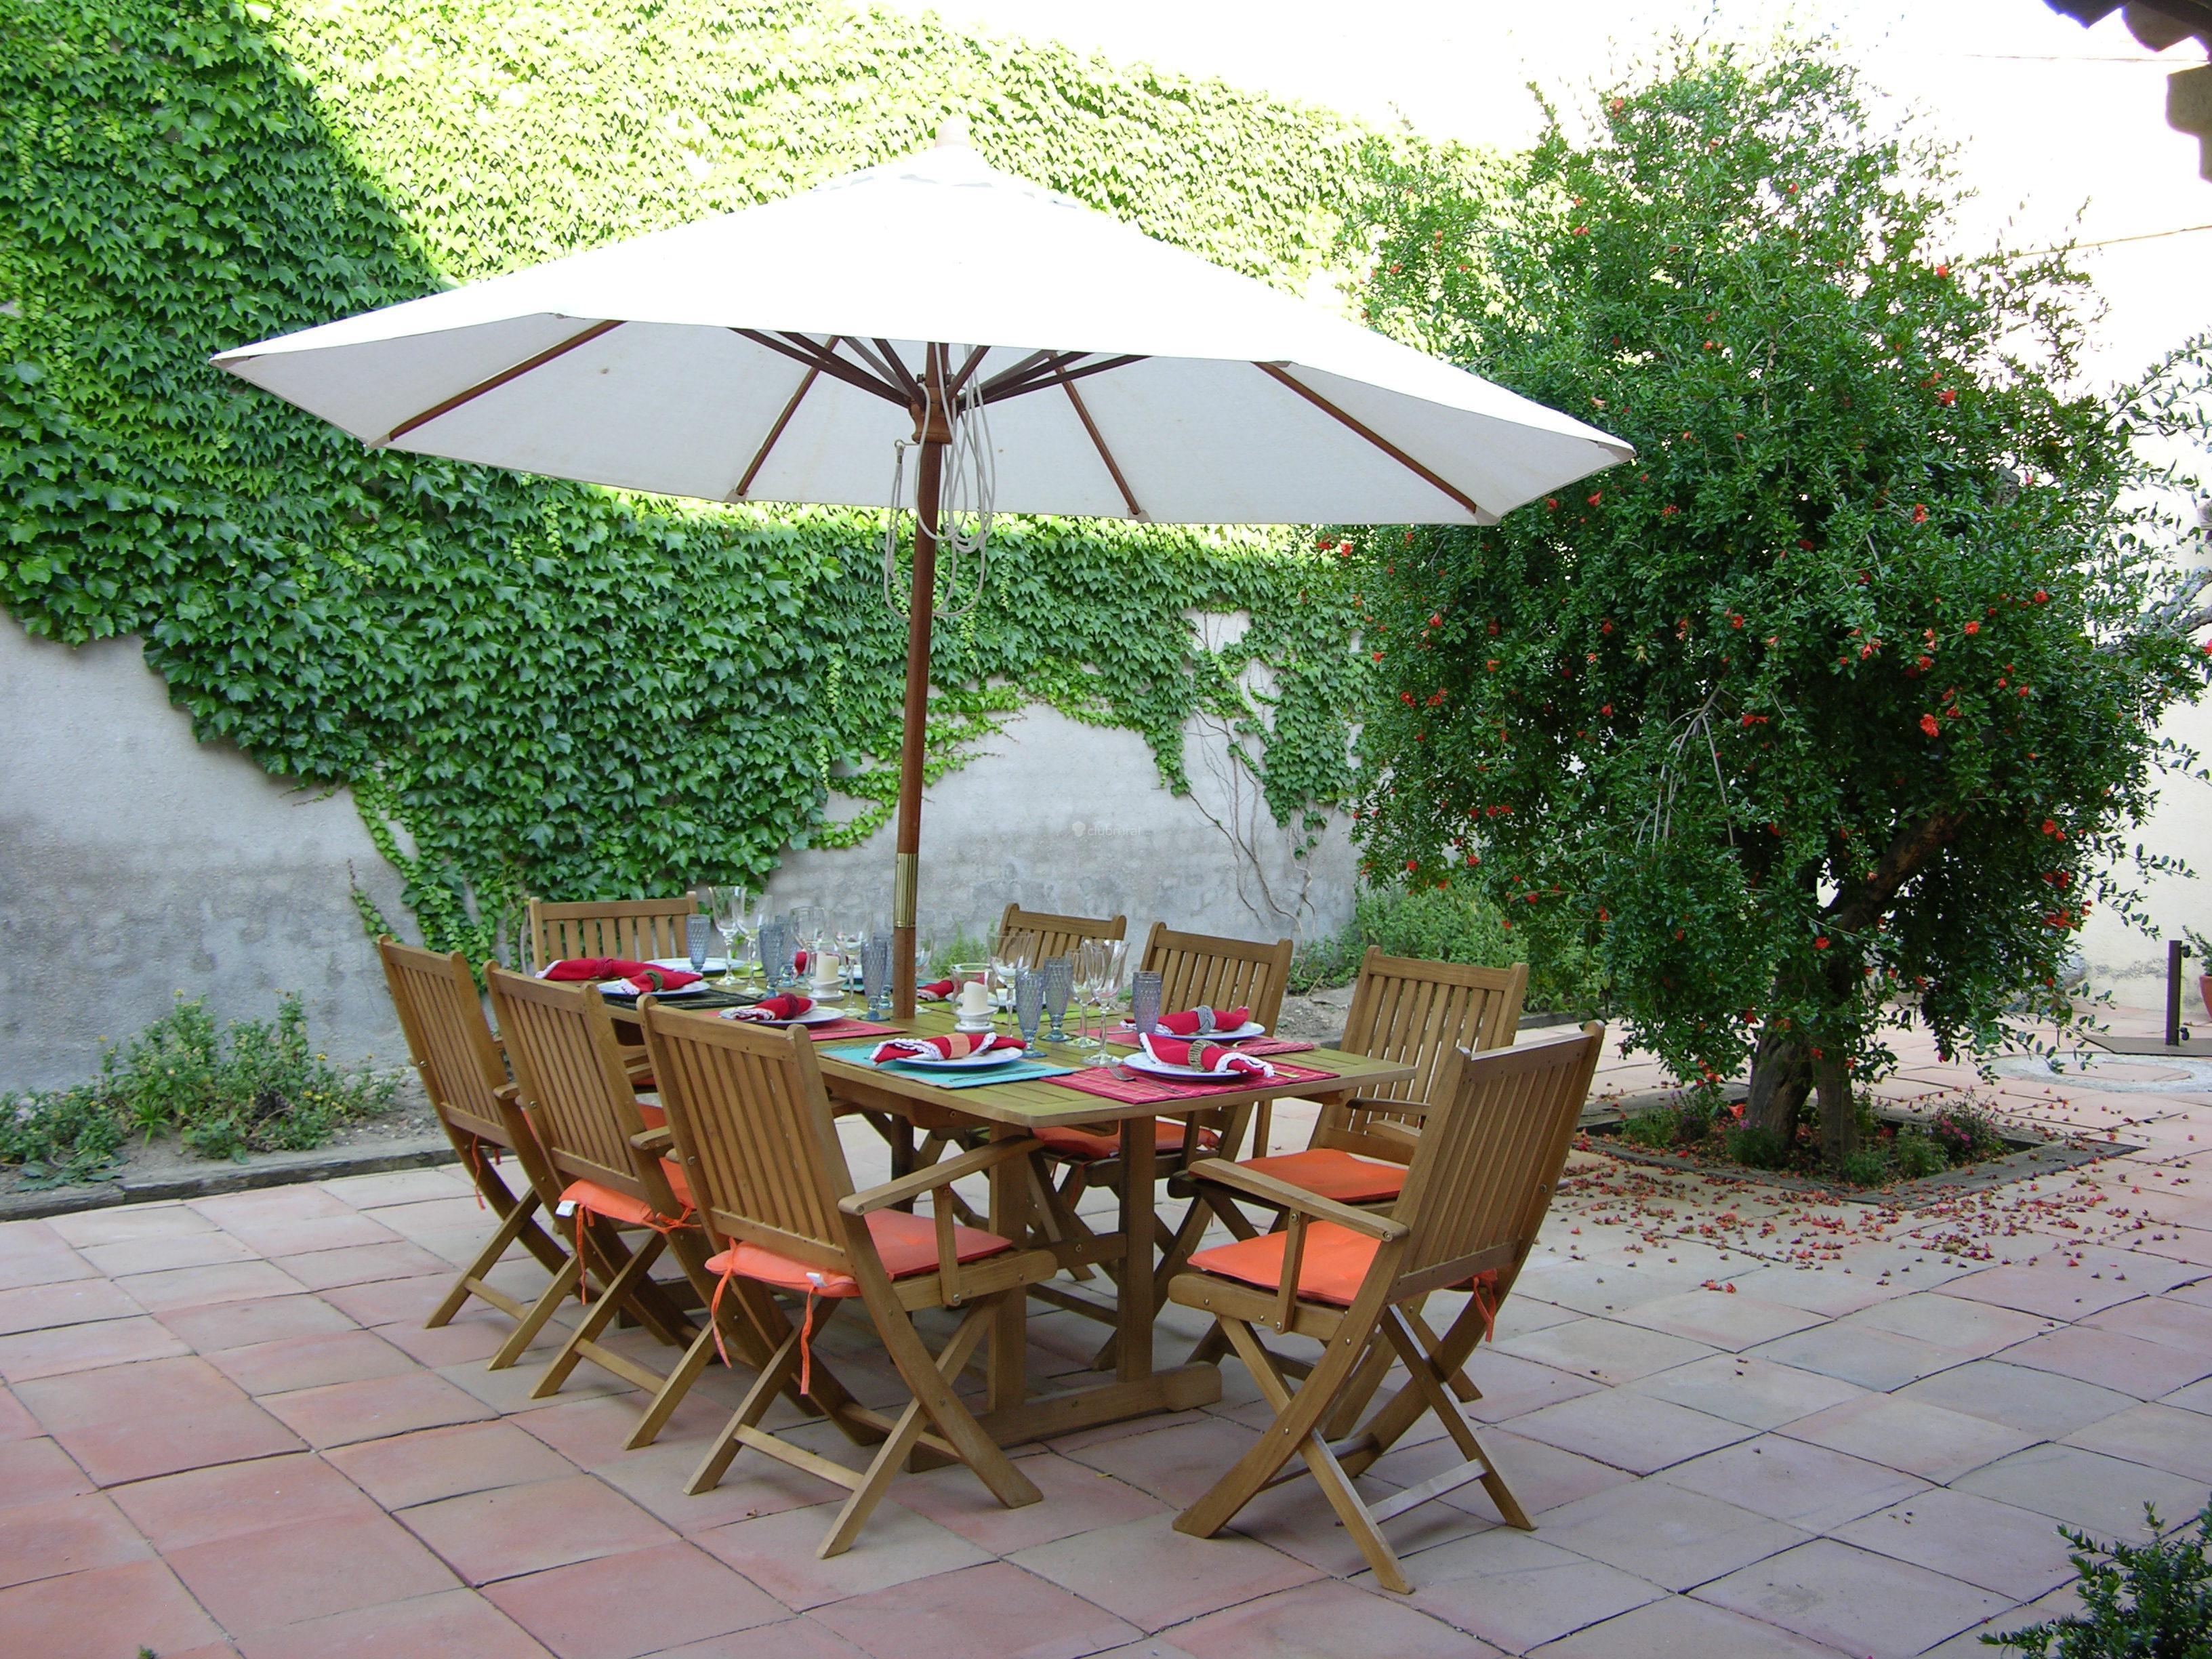 Fotos de la casa del piano toledo domingo perez clubrural - Casa rural toledo piscina ...